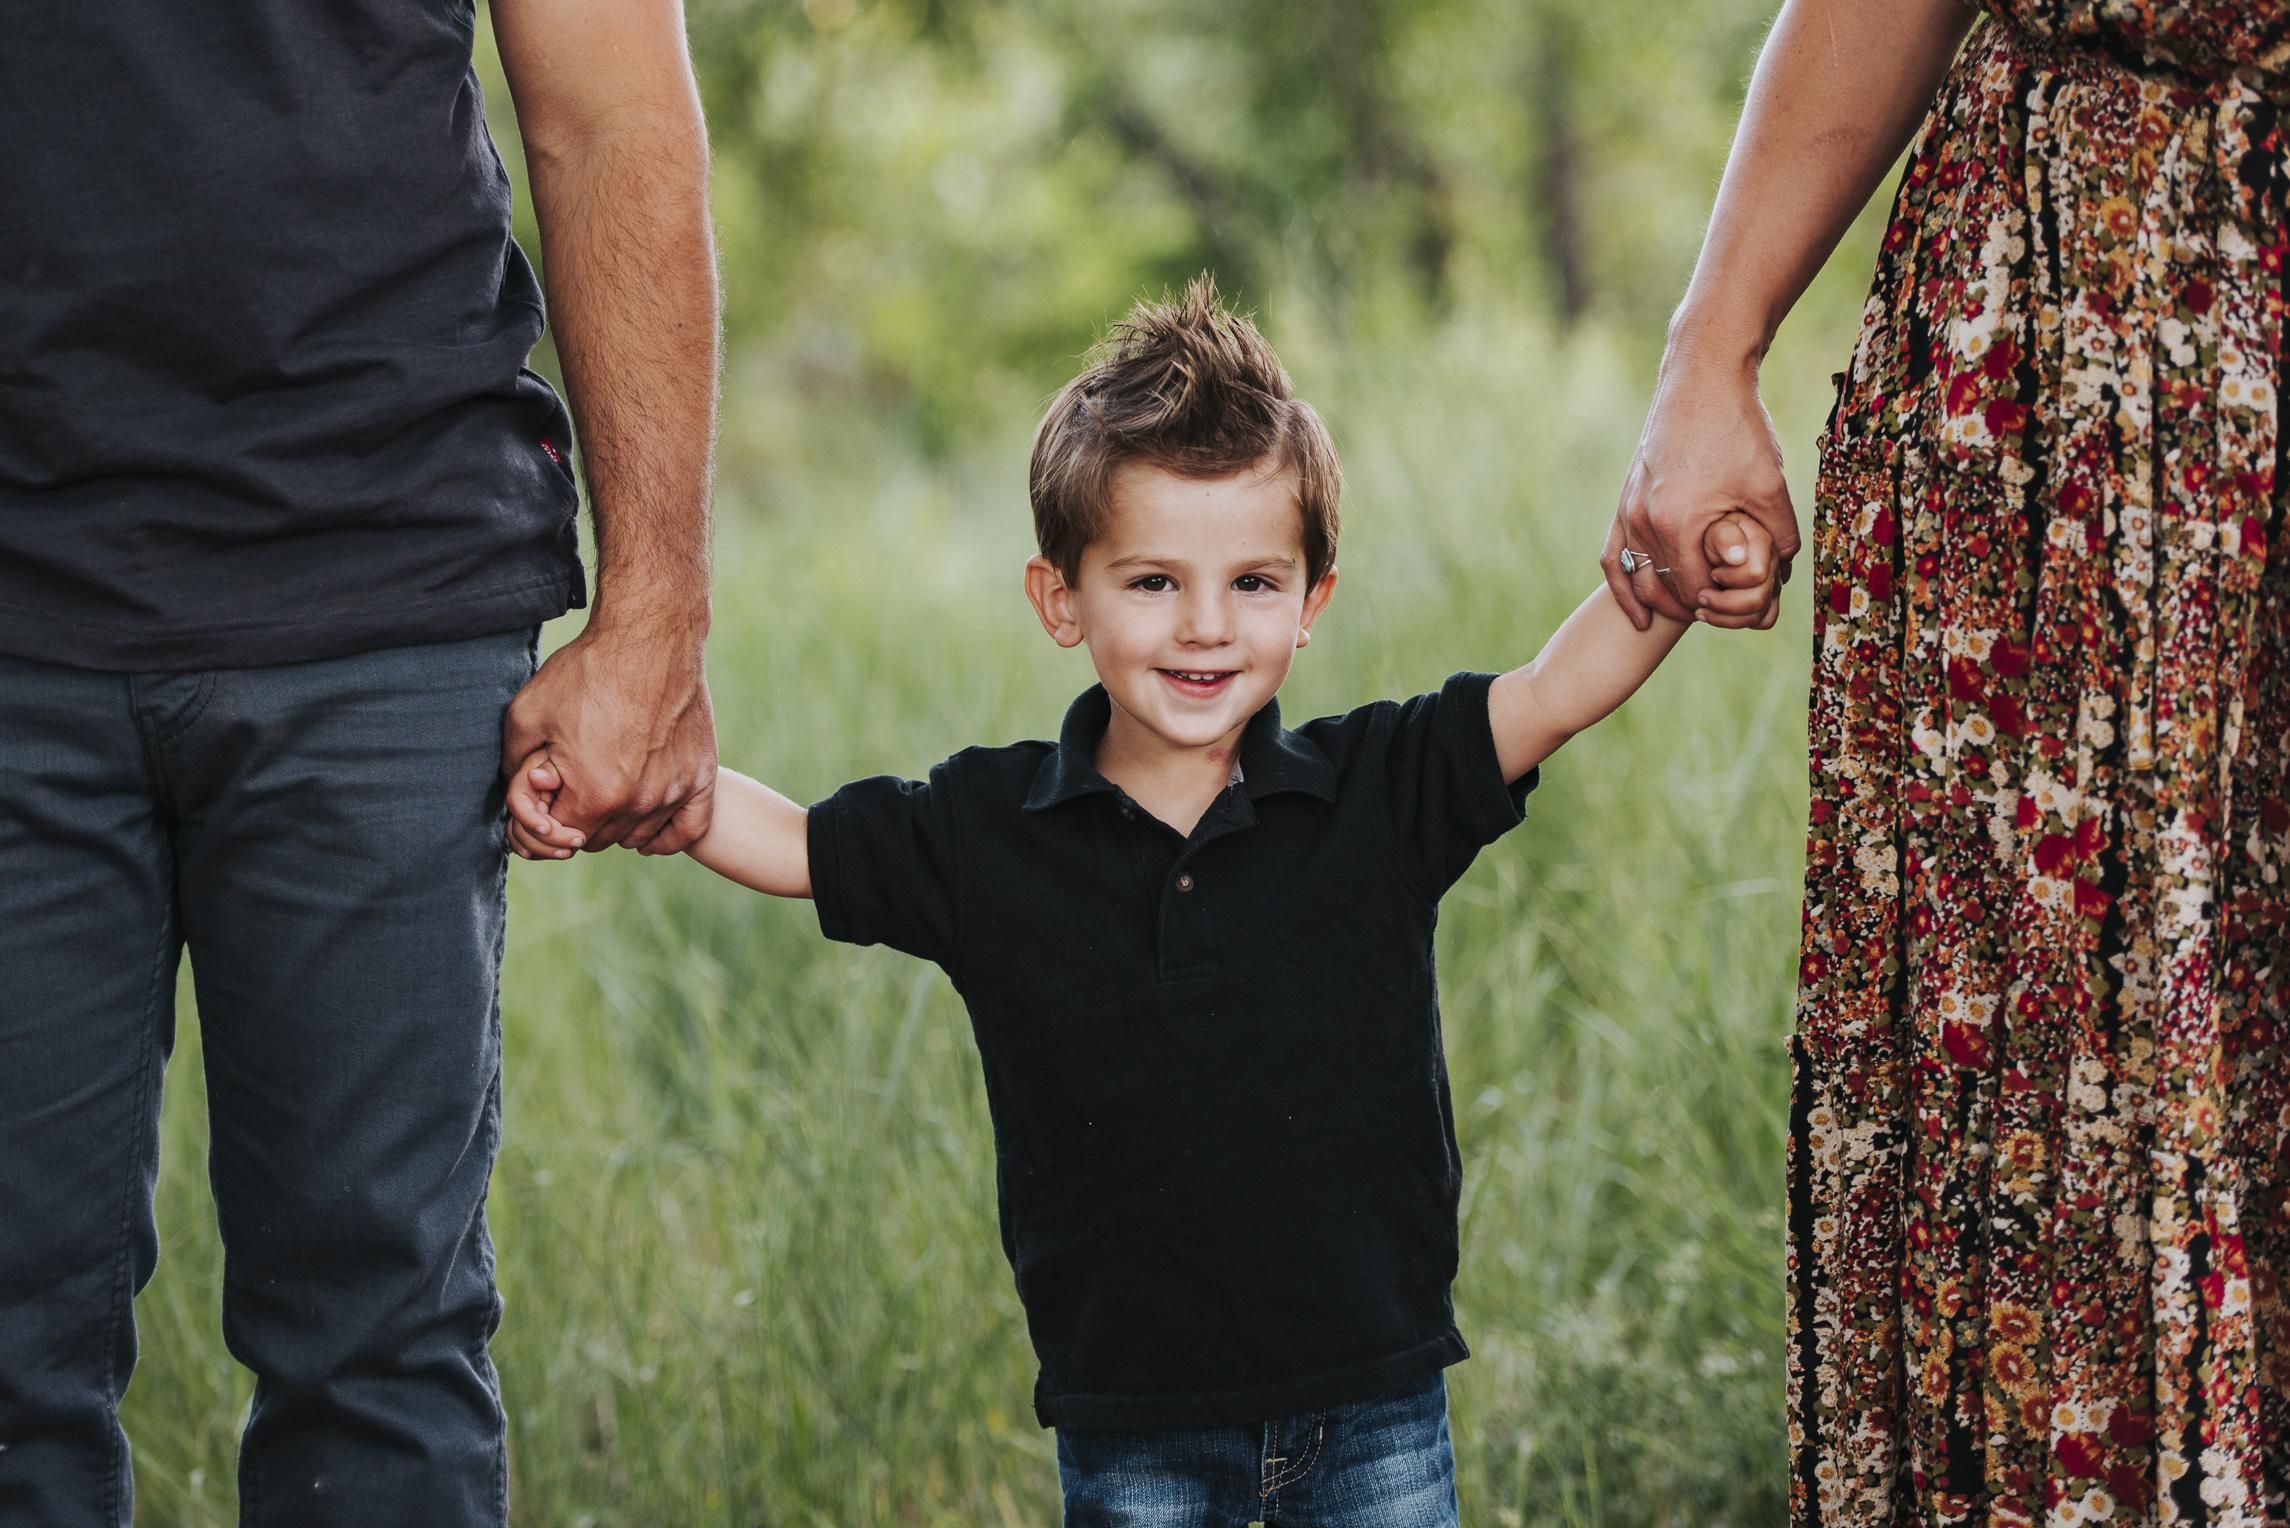 060716 webJAKE & MCKENNA FAMILY PHOTOS - COLORADO PHOTOGRAPHER - DEBI RAE PHOTOGRAPHY-5271.jpg